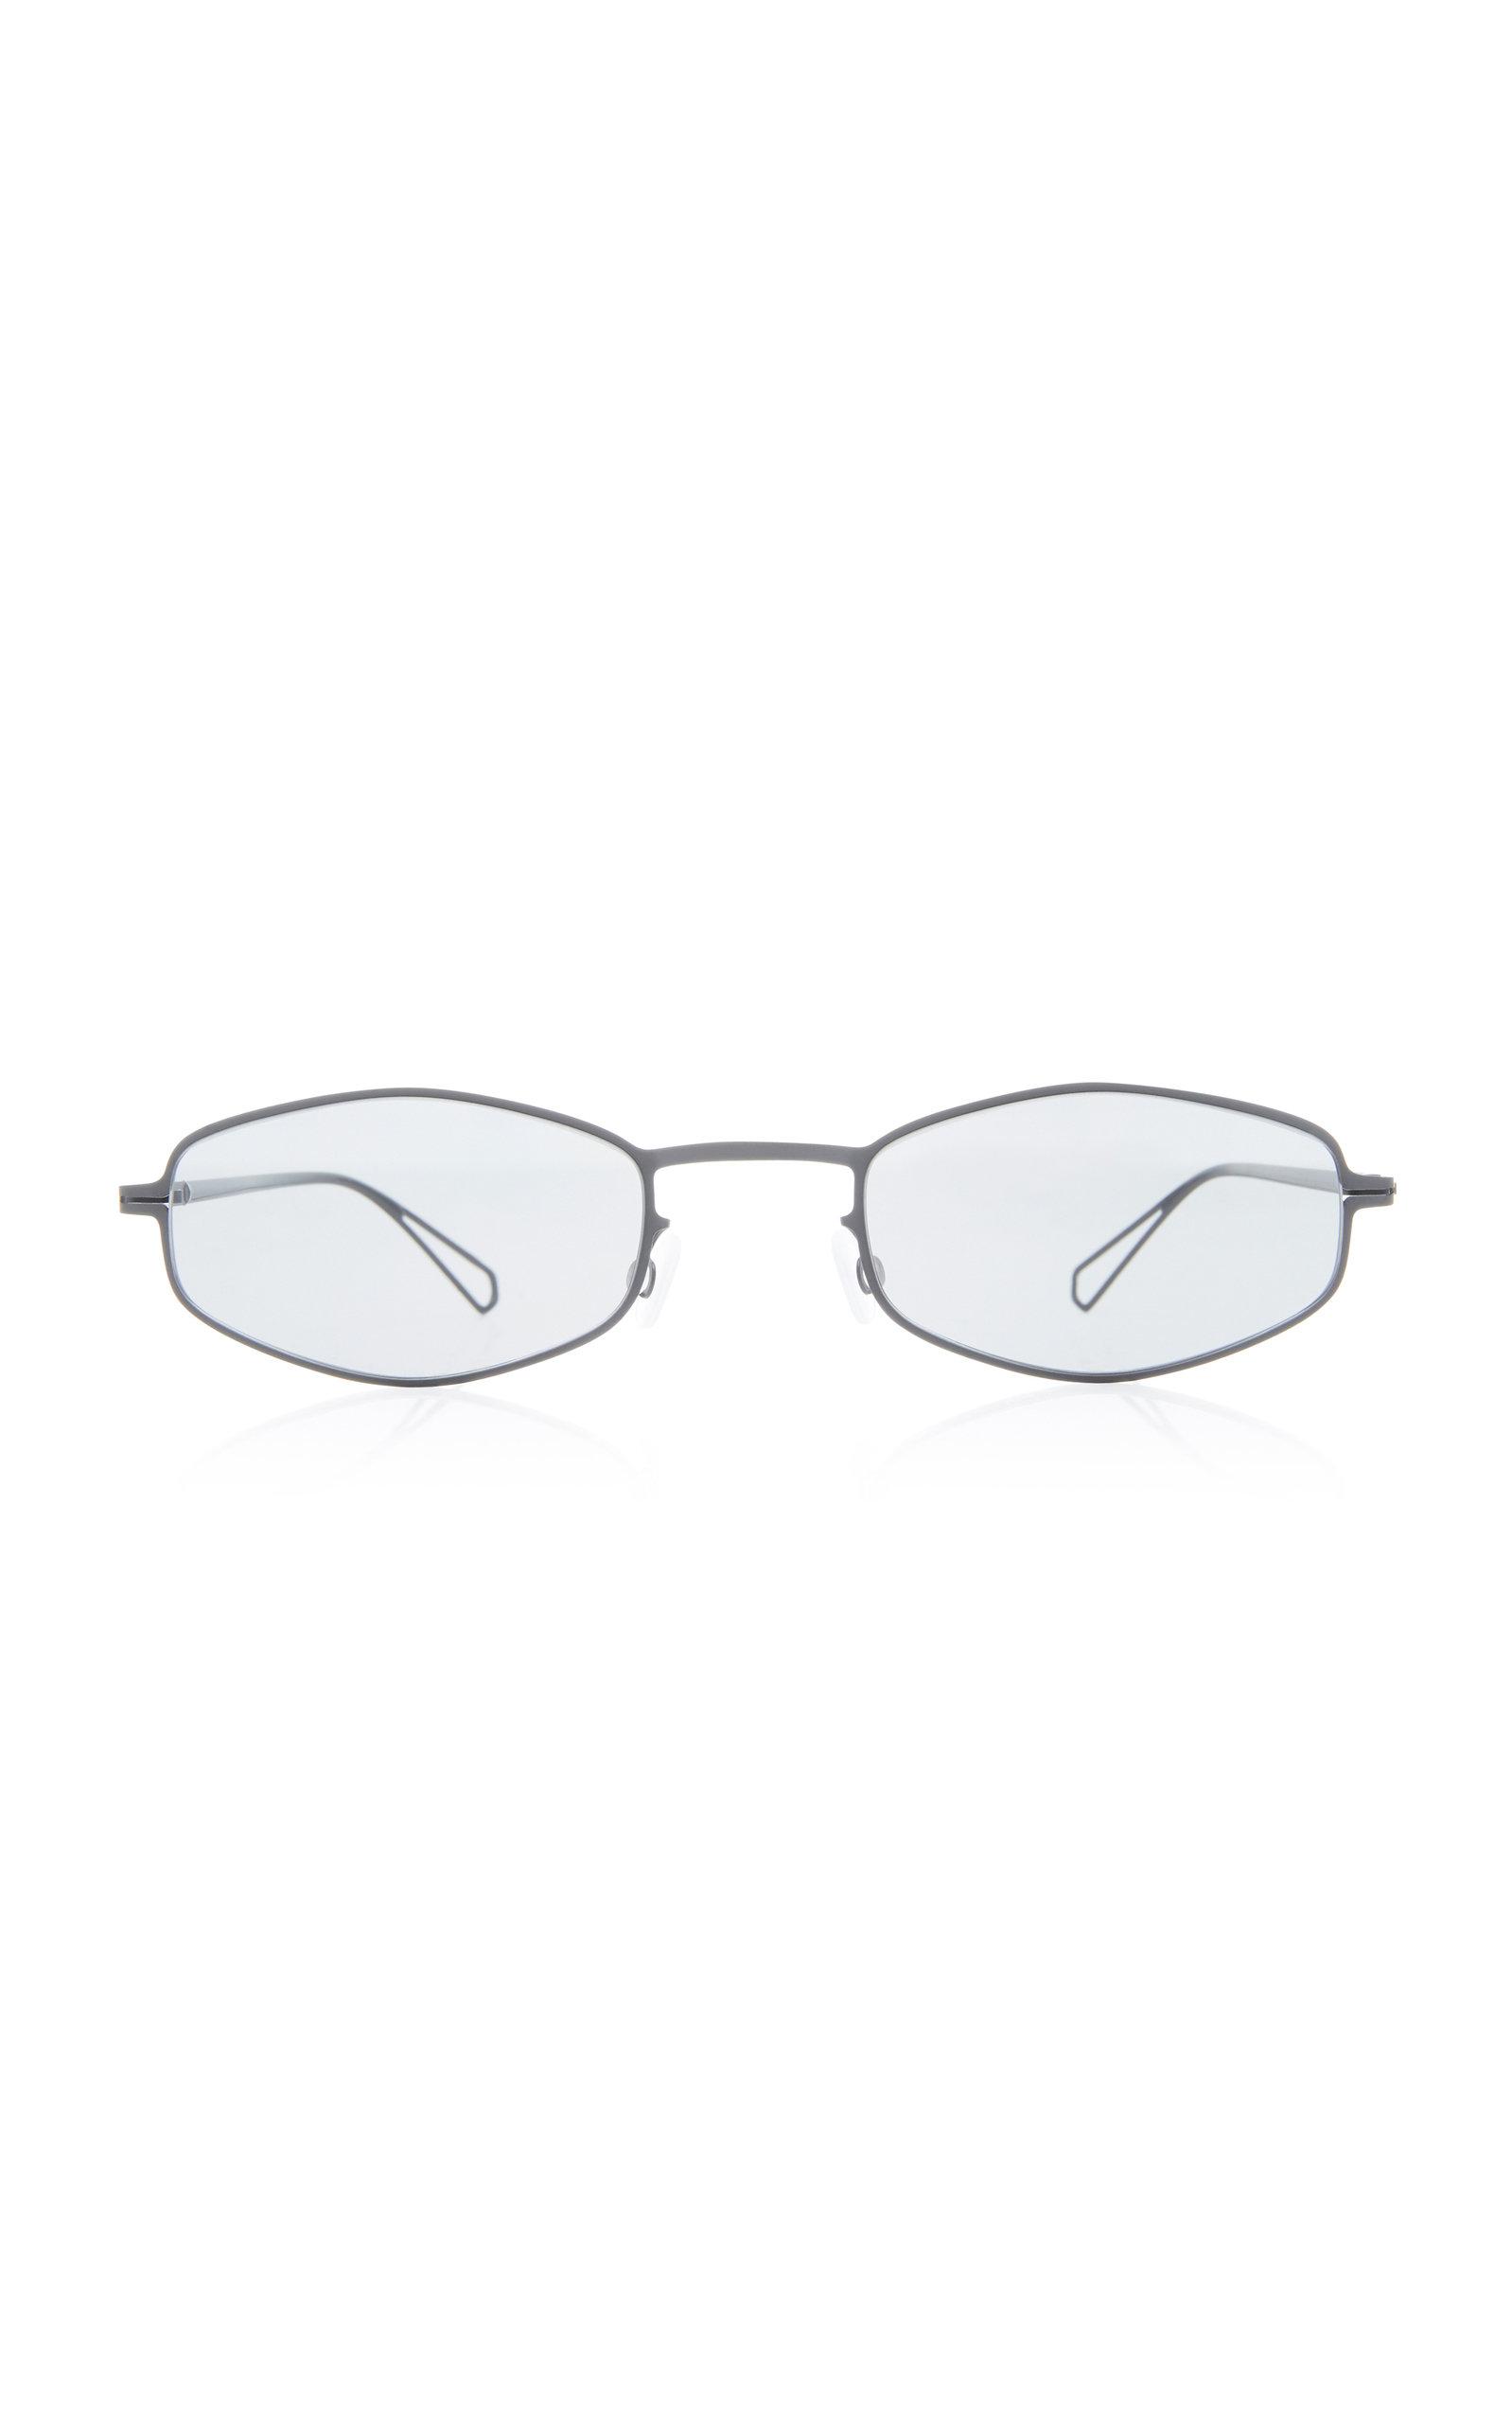 f4fd6f131ea Oval-Shaped Sunglasses by Mykita